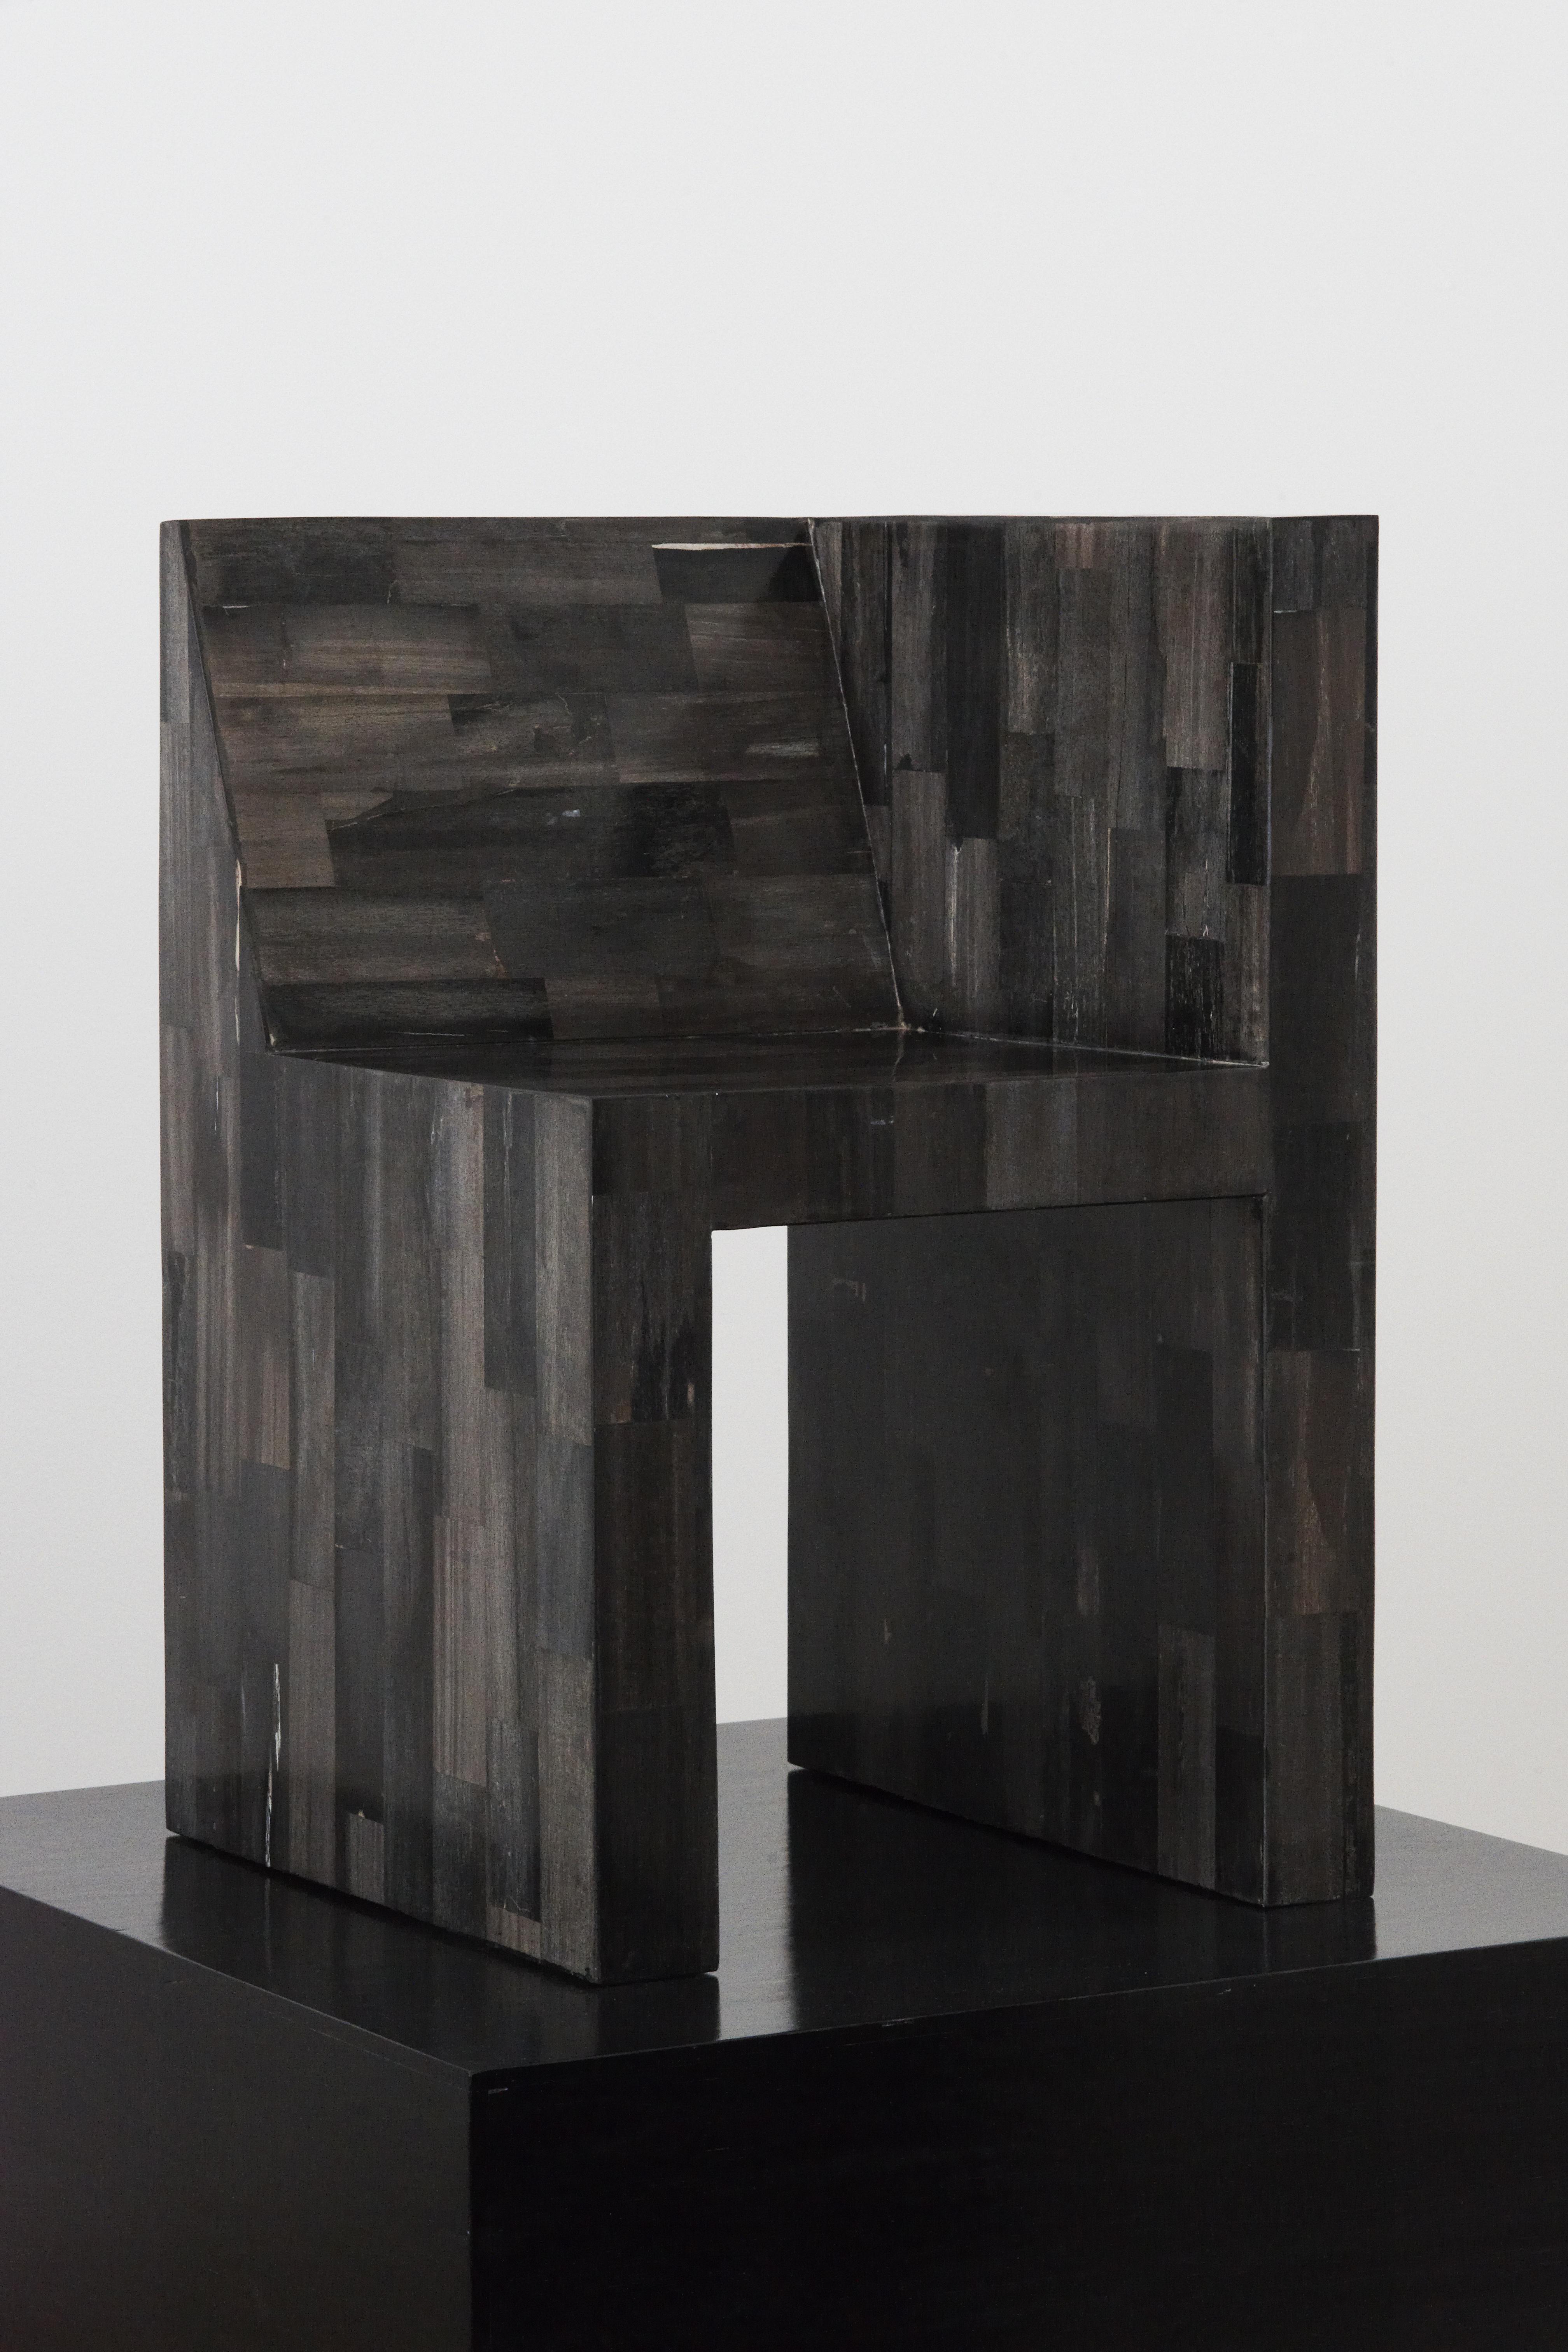 OWENS_Half Box (Petrified Wood)_01